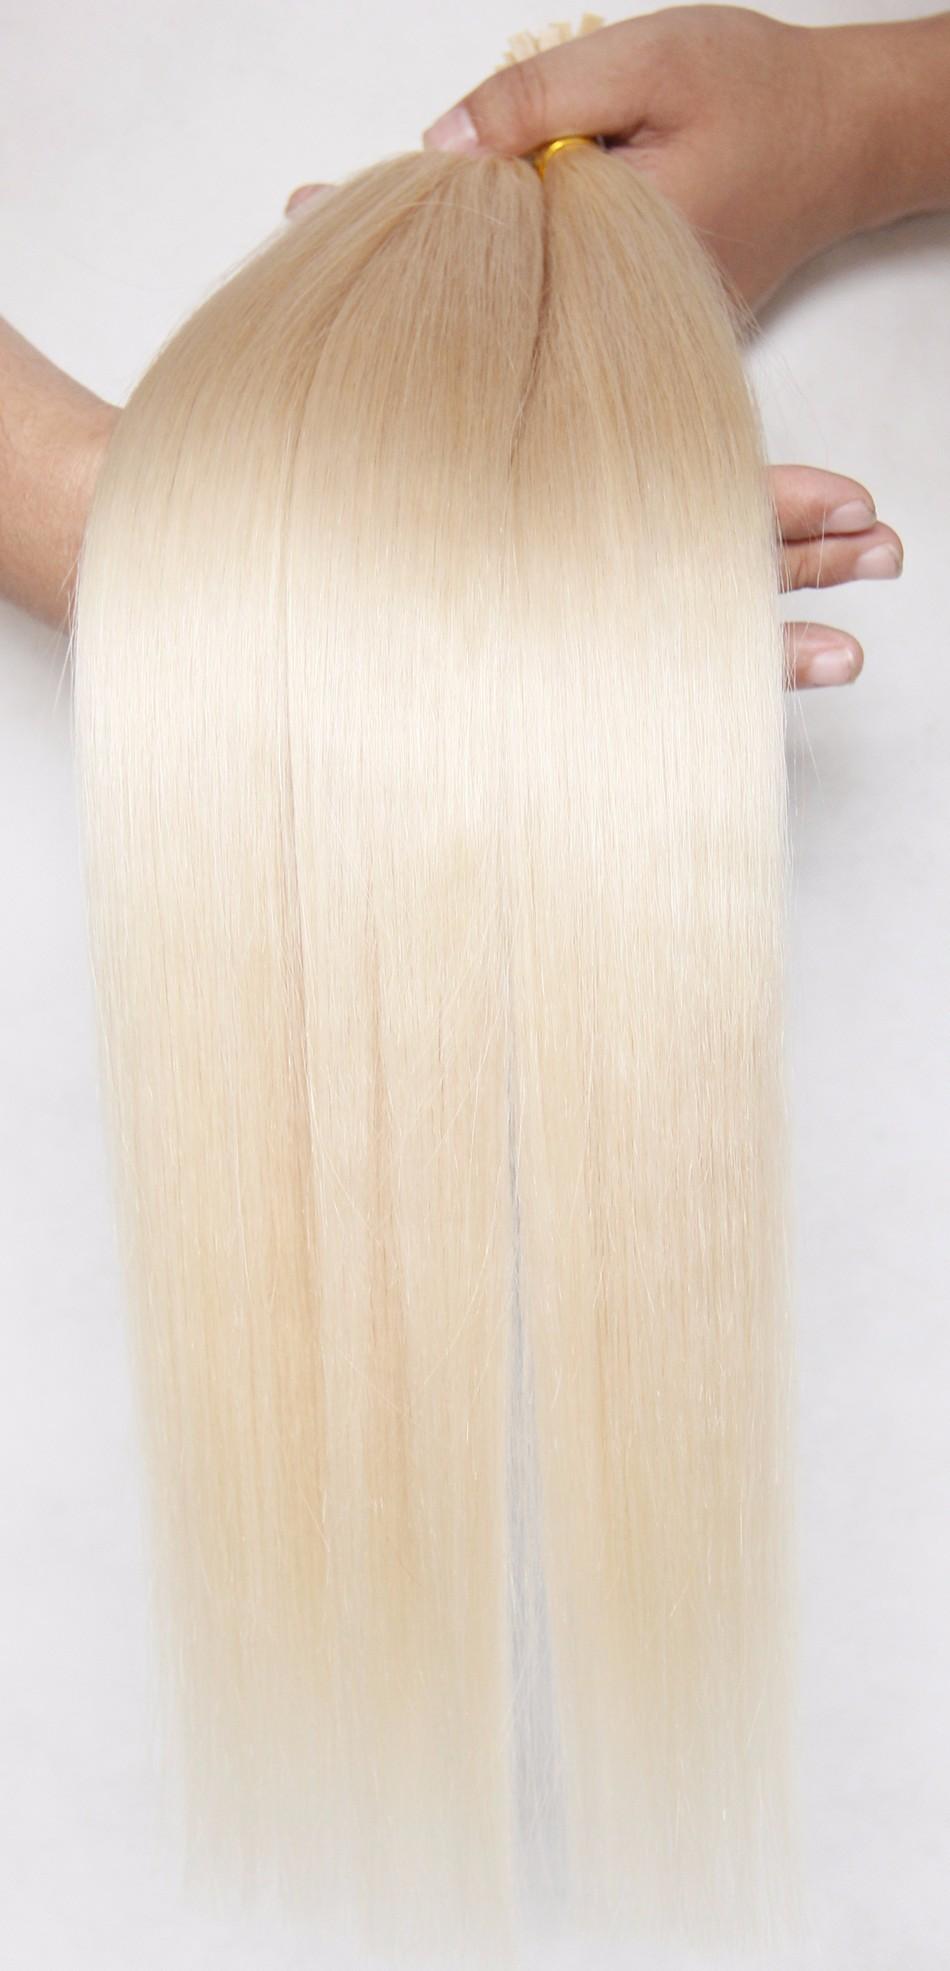 9A Brazilian Flat Tip Hair Extensions Straight Double Drawn Virgin Hair Pre Bonded Hair Extension Keratin fusion hair extensions